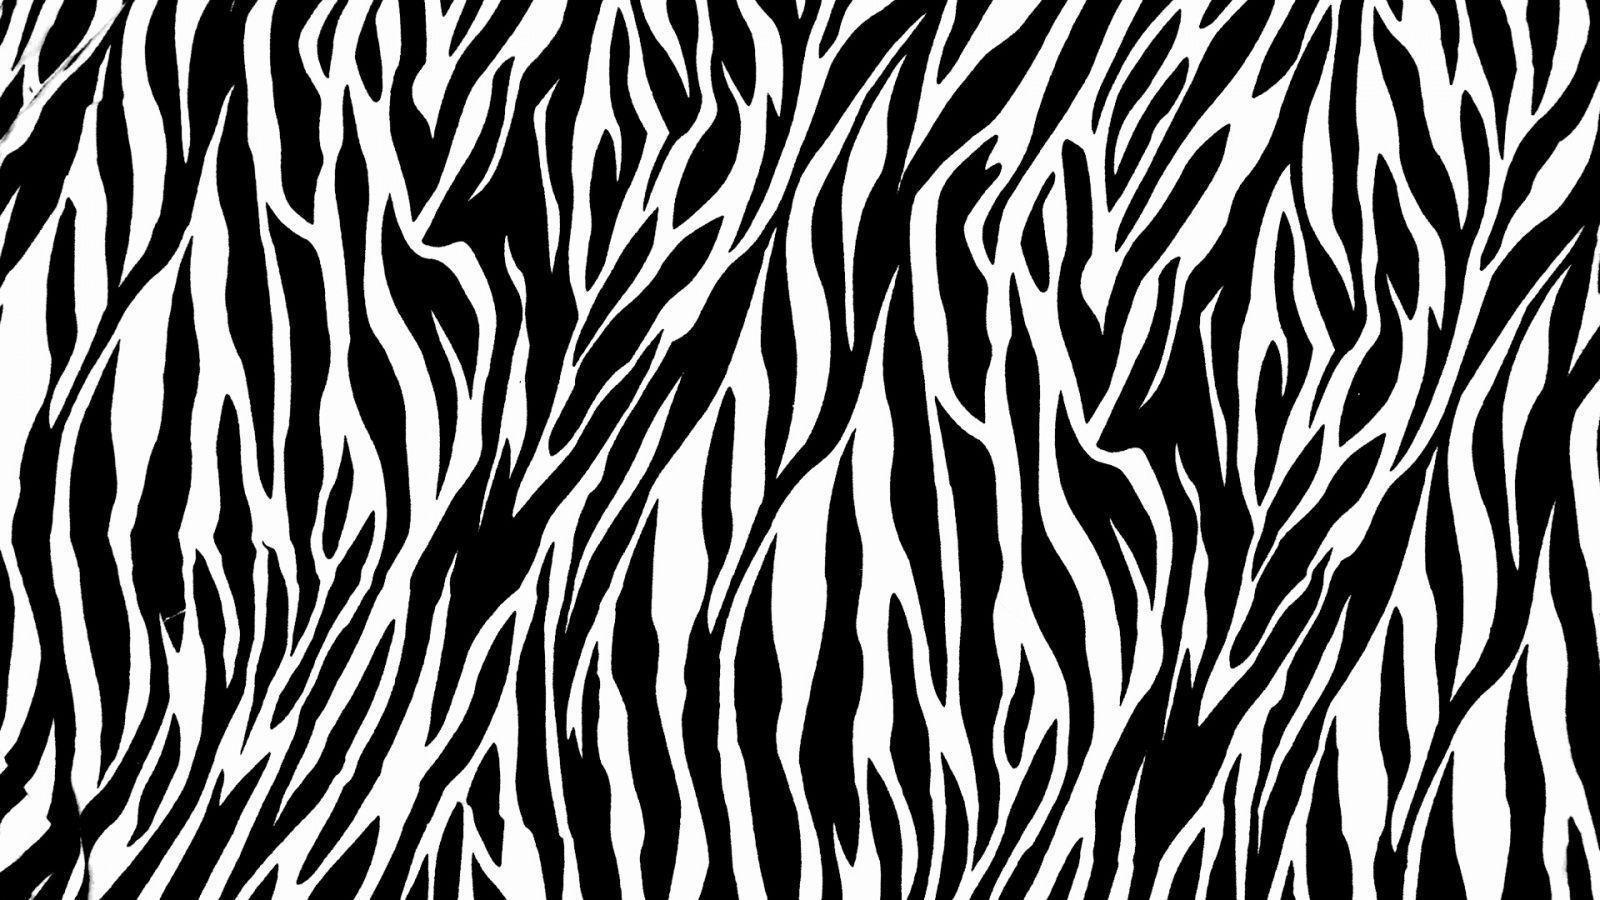 Animal Print Wallpaper Hd Animal Print Desktop Backgrounds Wallpaper Cave